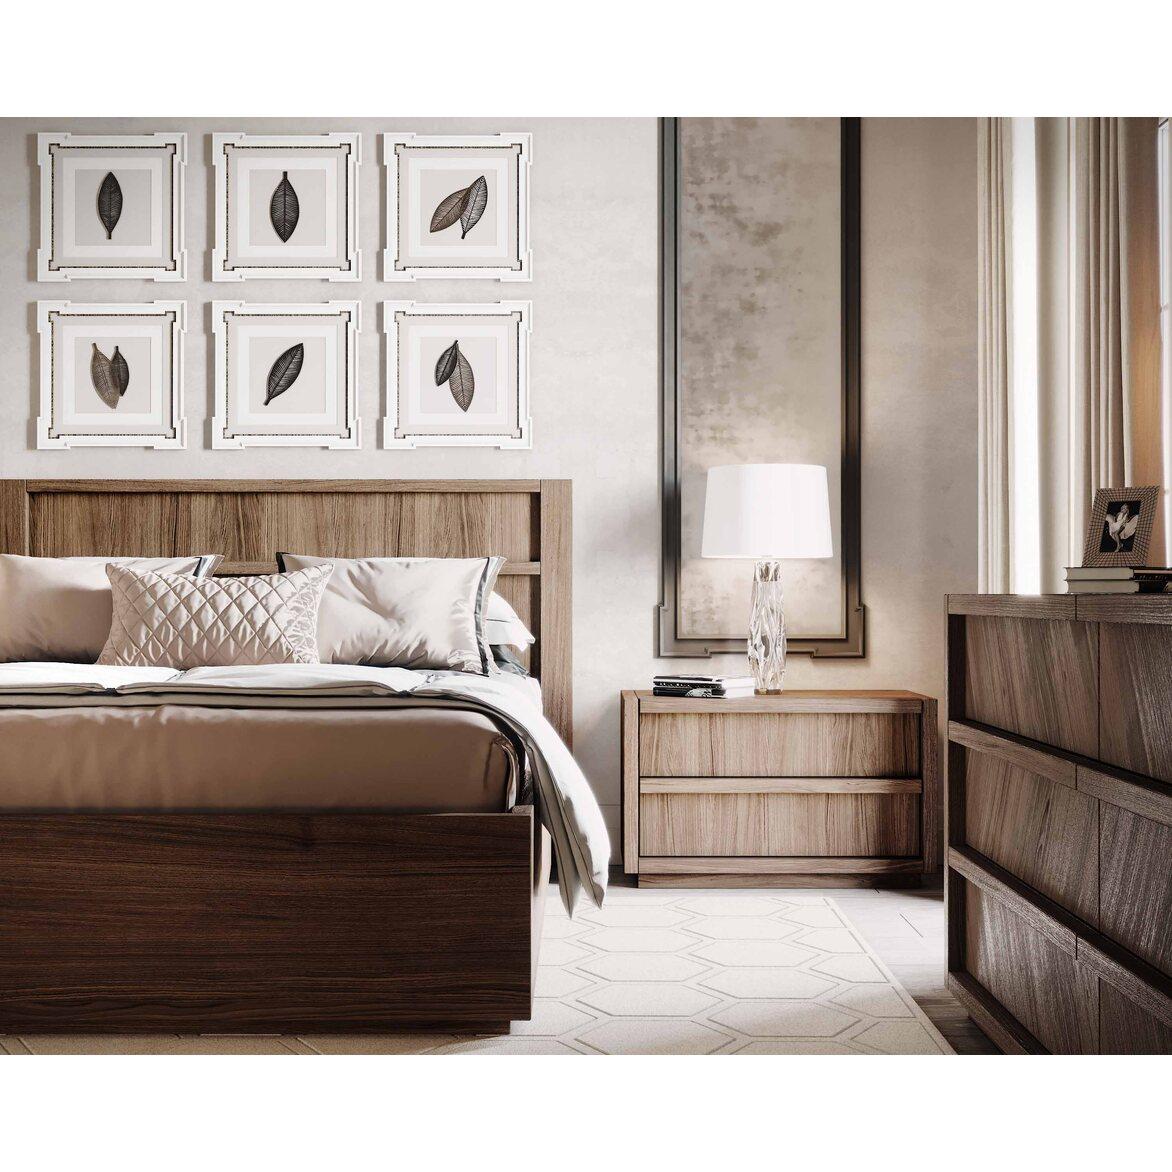 "Кровать 180*200 ""Brenson"" 5 | Двуспальные кровати Kingsby"